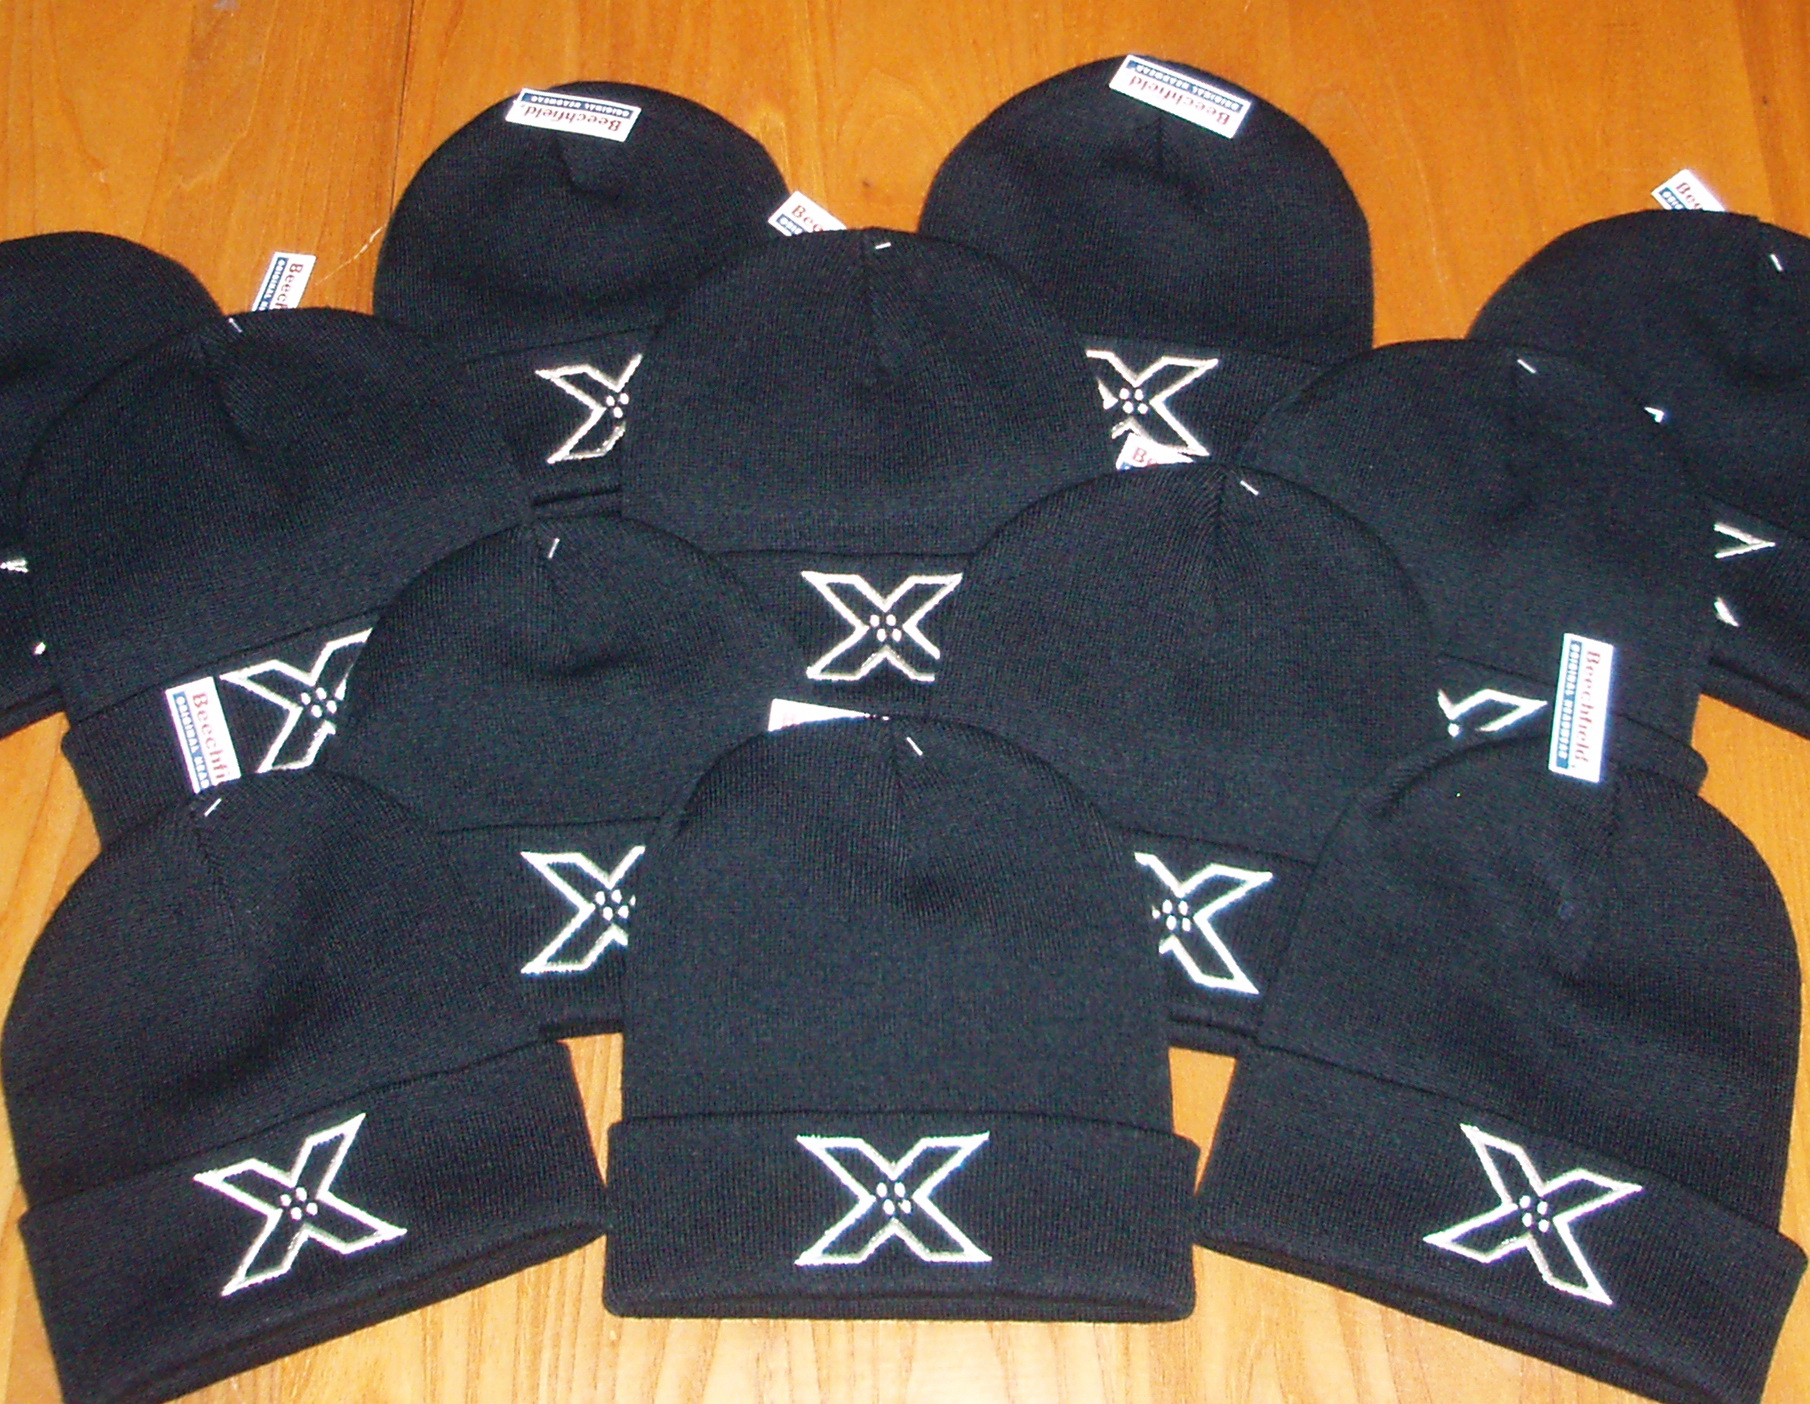 Bradley Arms Beanie Hats